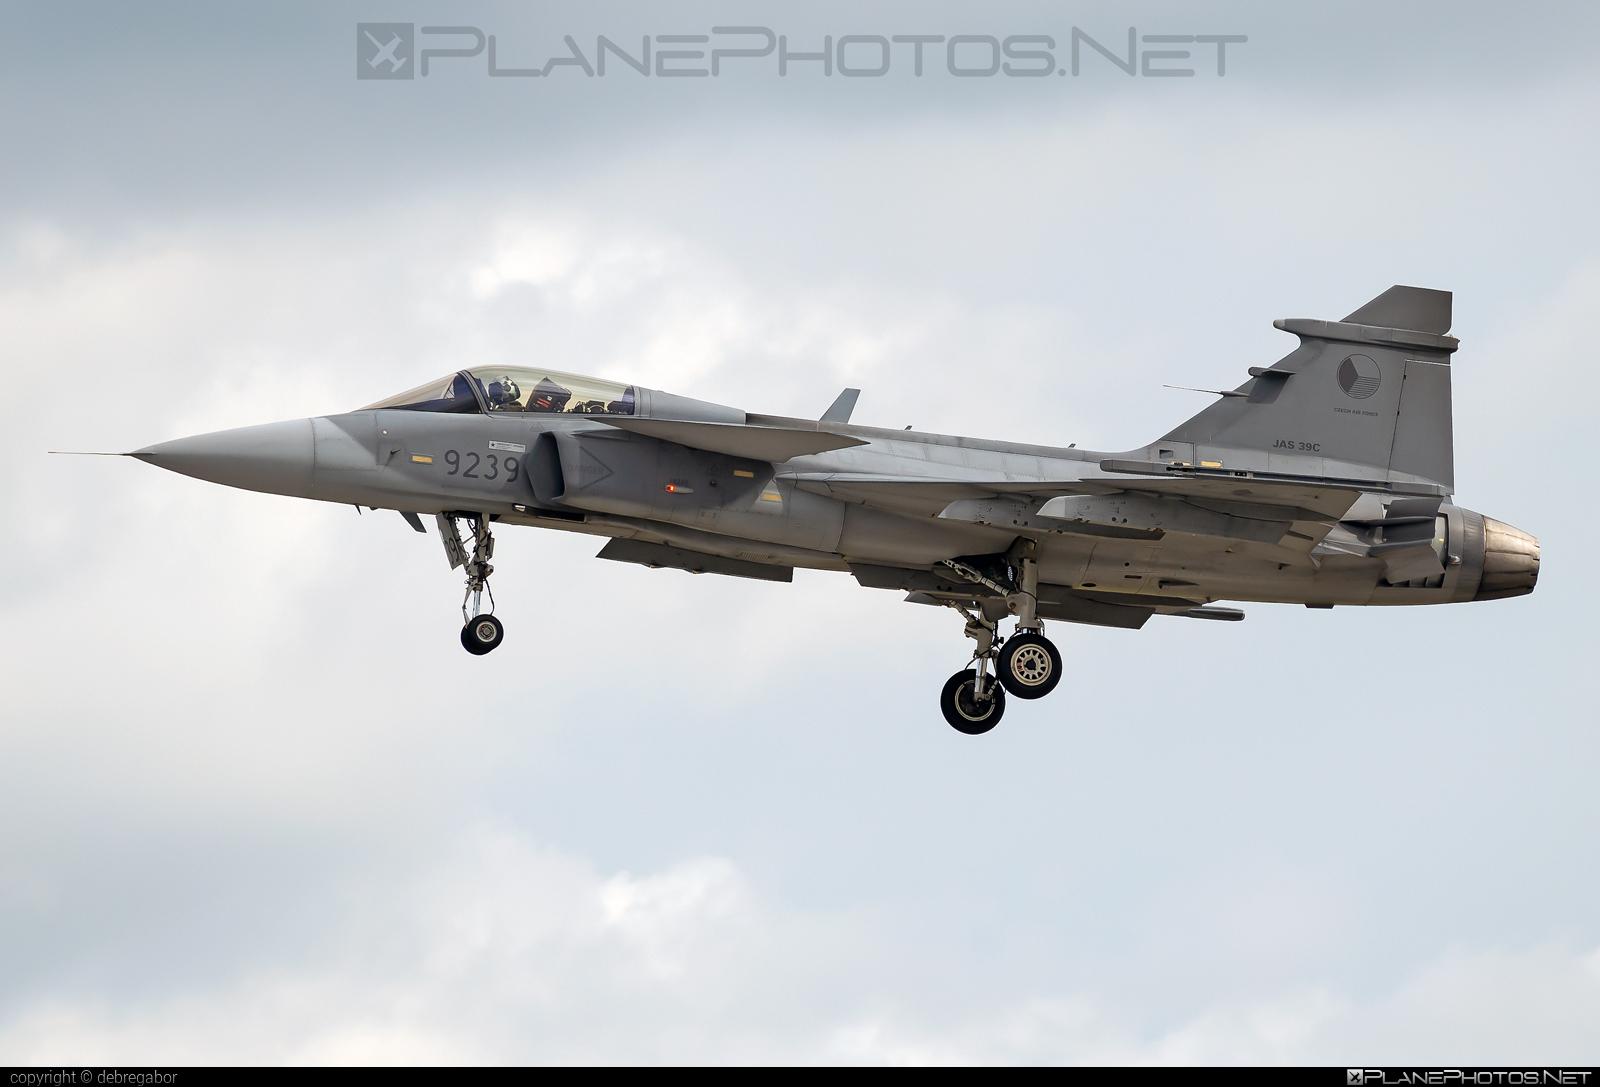 Saab JAS 39C Gripen - 9239 operated by Vzdušné síly AČR (Czech Air Force) #czechairforce #gripen #jas39 #jas39c #jas39gripen #kecskemetairshow2021 #saab #vzdusnesilyacr